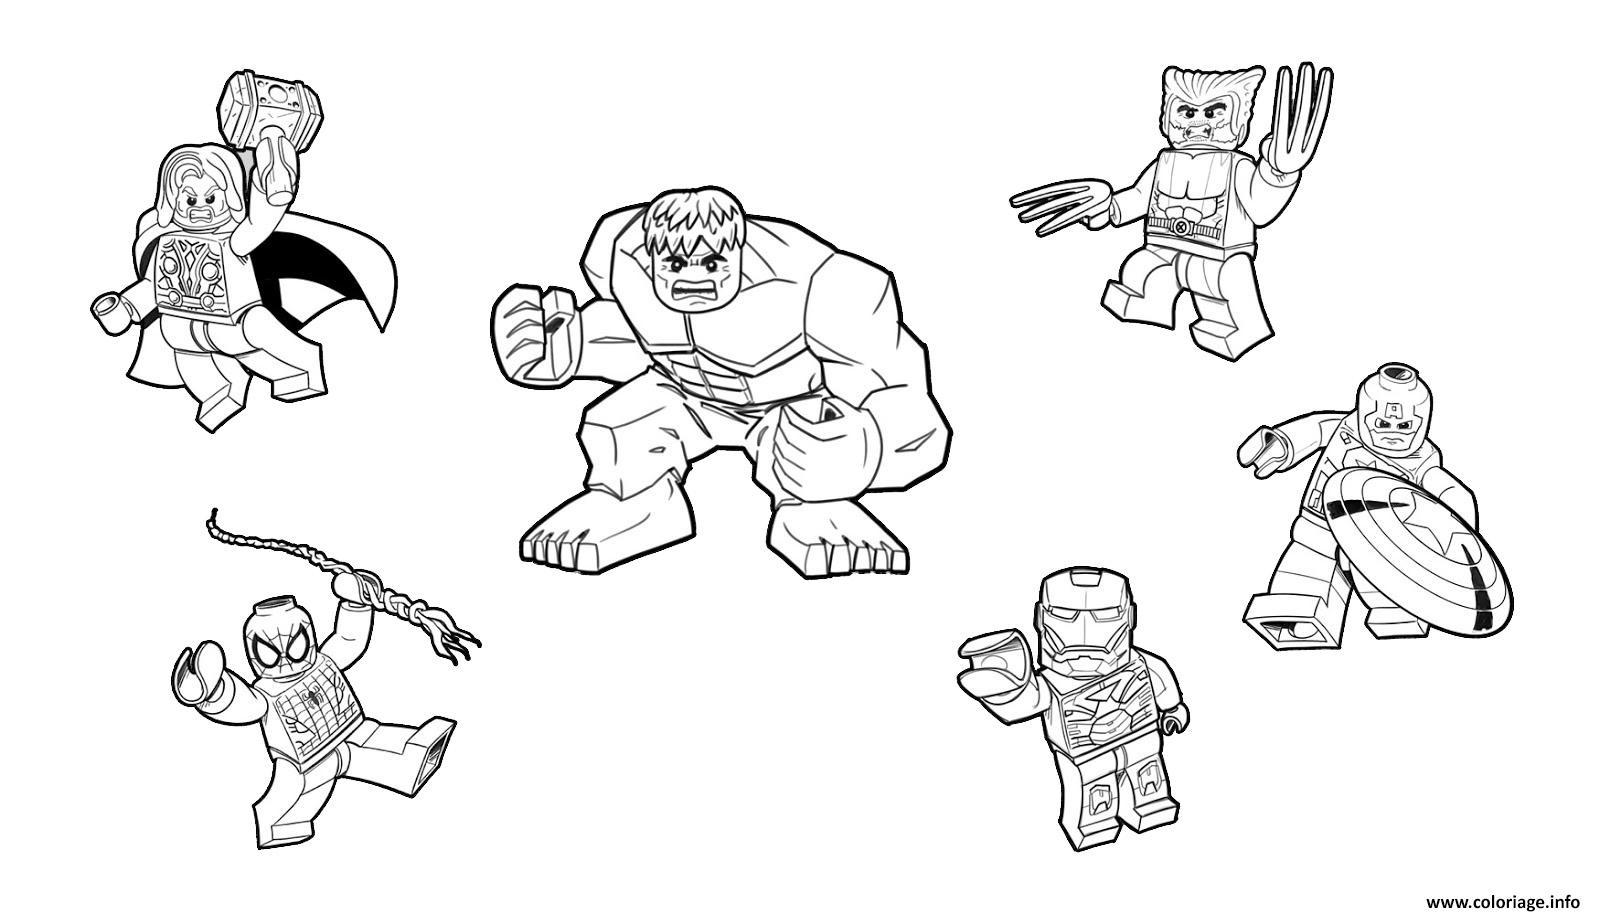 Coloriage team lego marvel hulk ironman spiderman thor america wolverine dessin - Coloriage spiderman et hulk ...